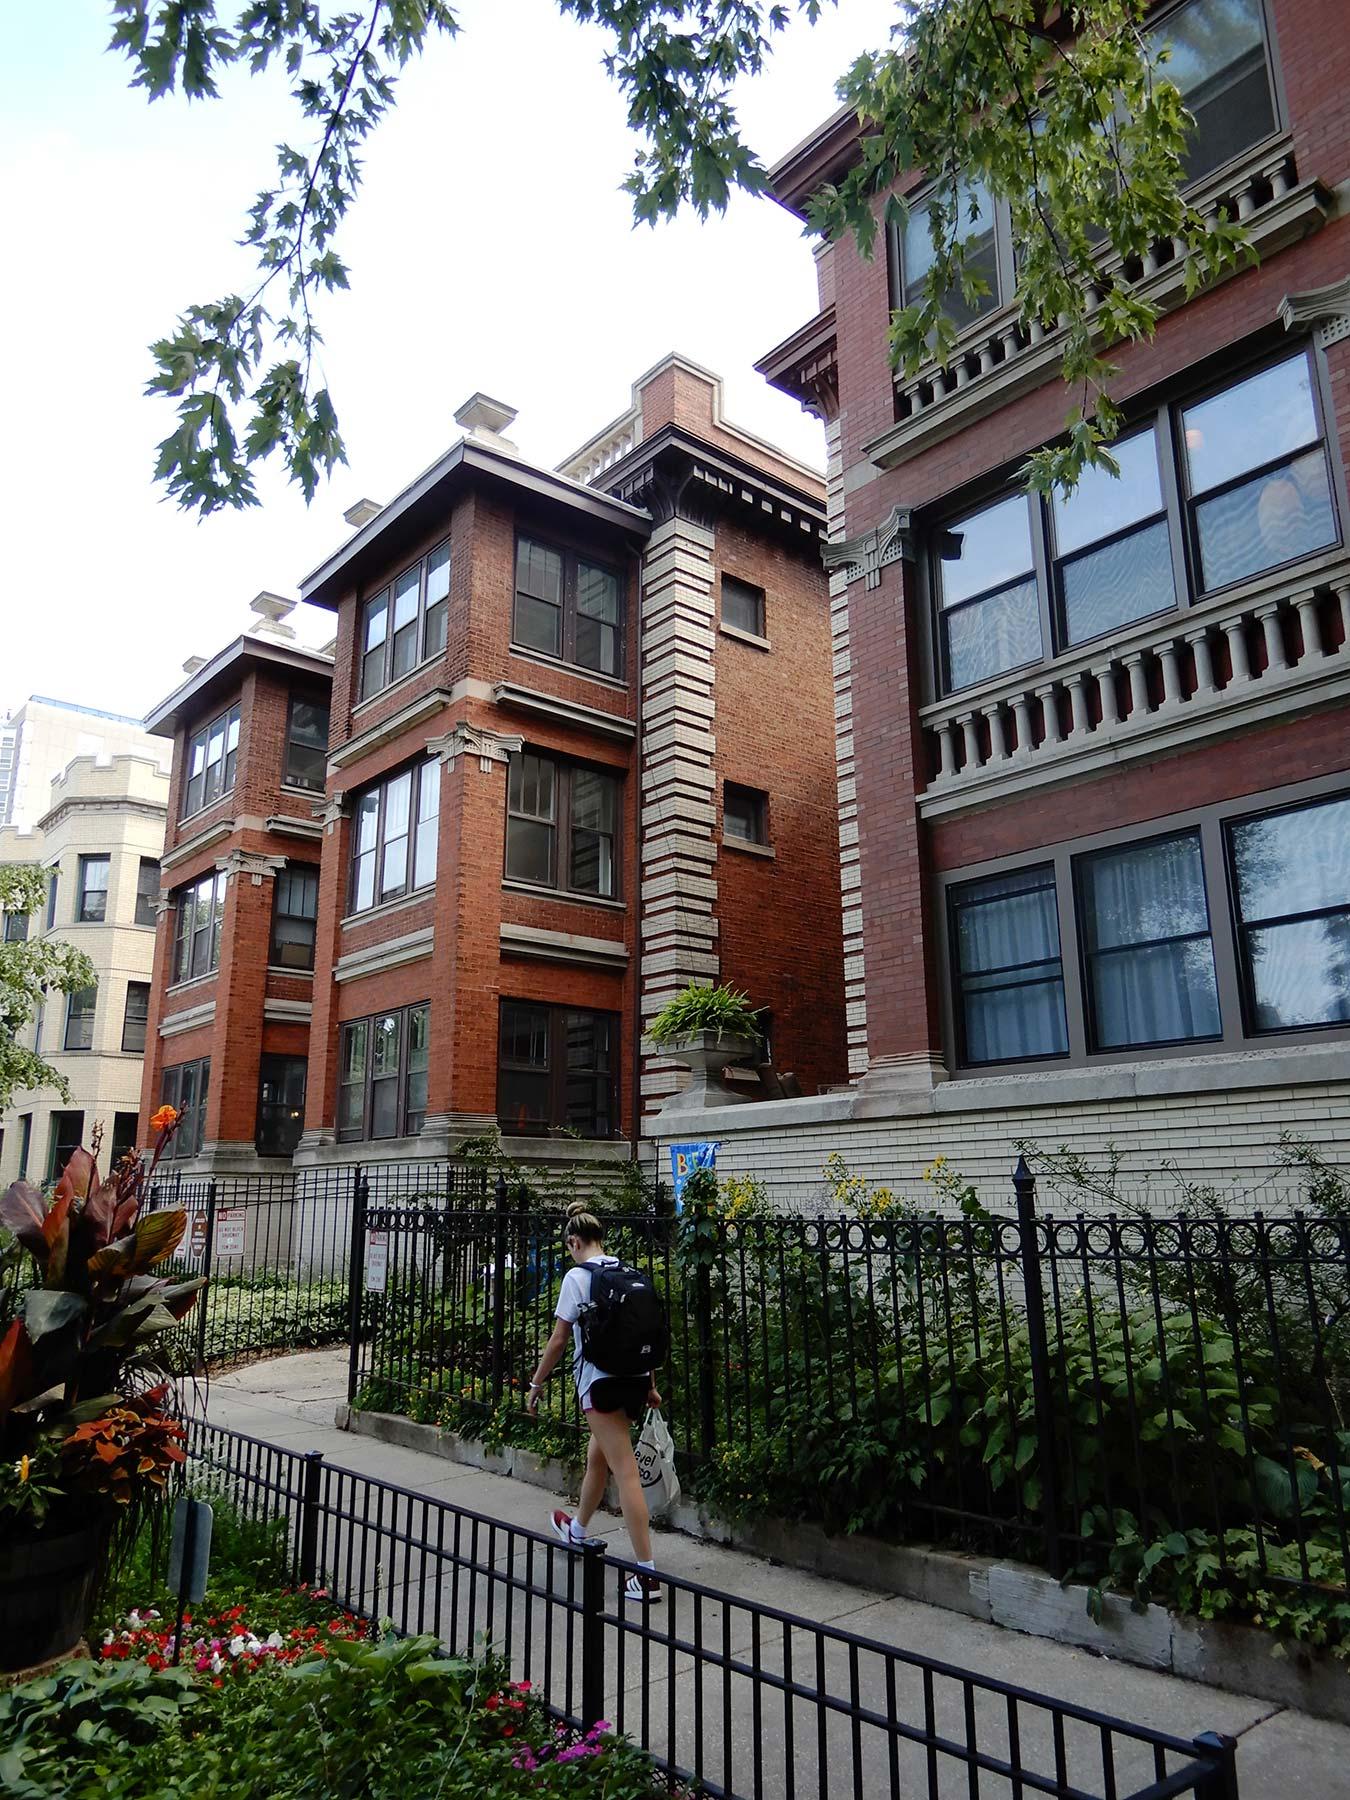 Sandegren-designed apartments at 813-819 W. Buena Avenue. Photo by Julia Bachrach.